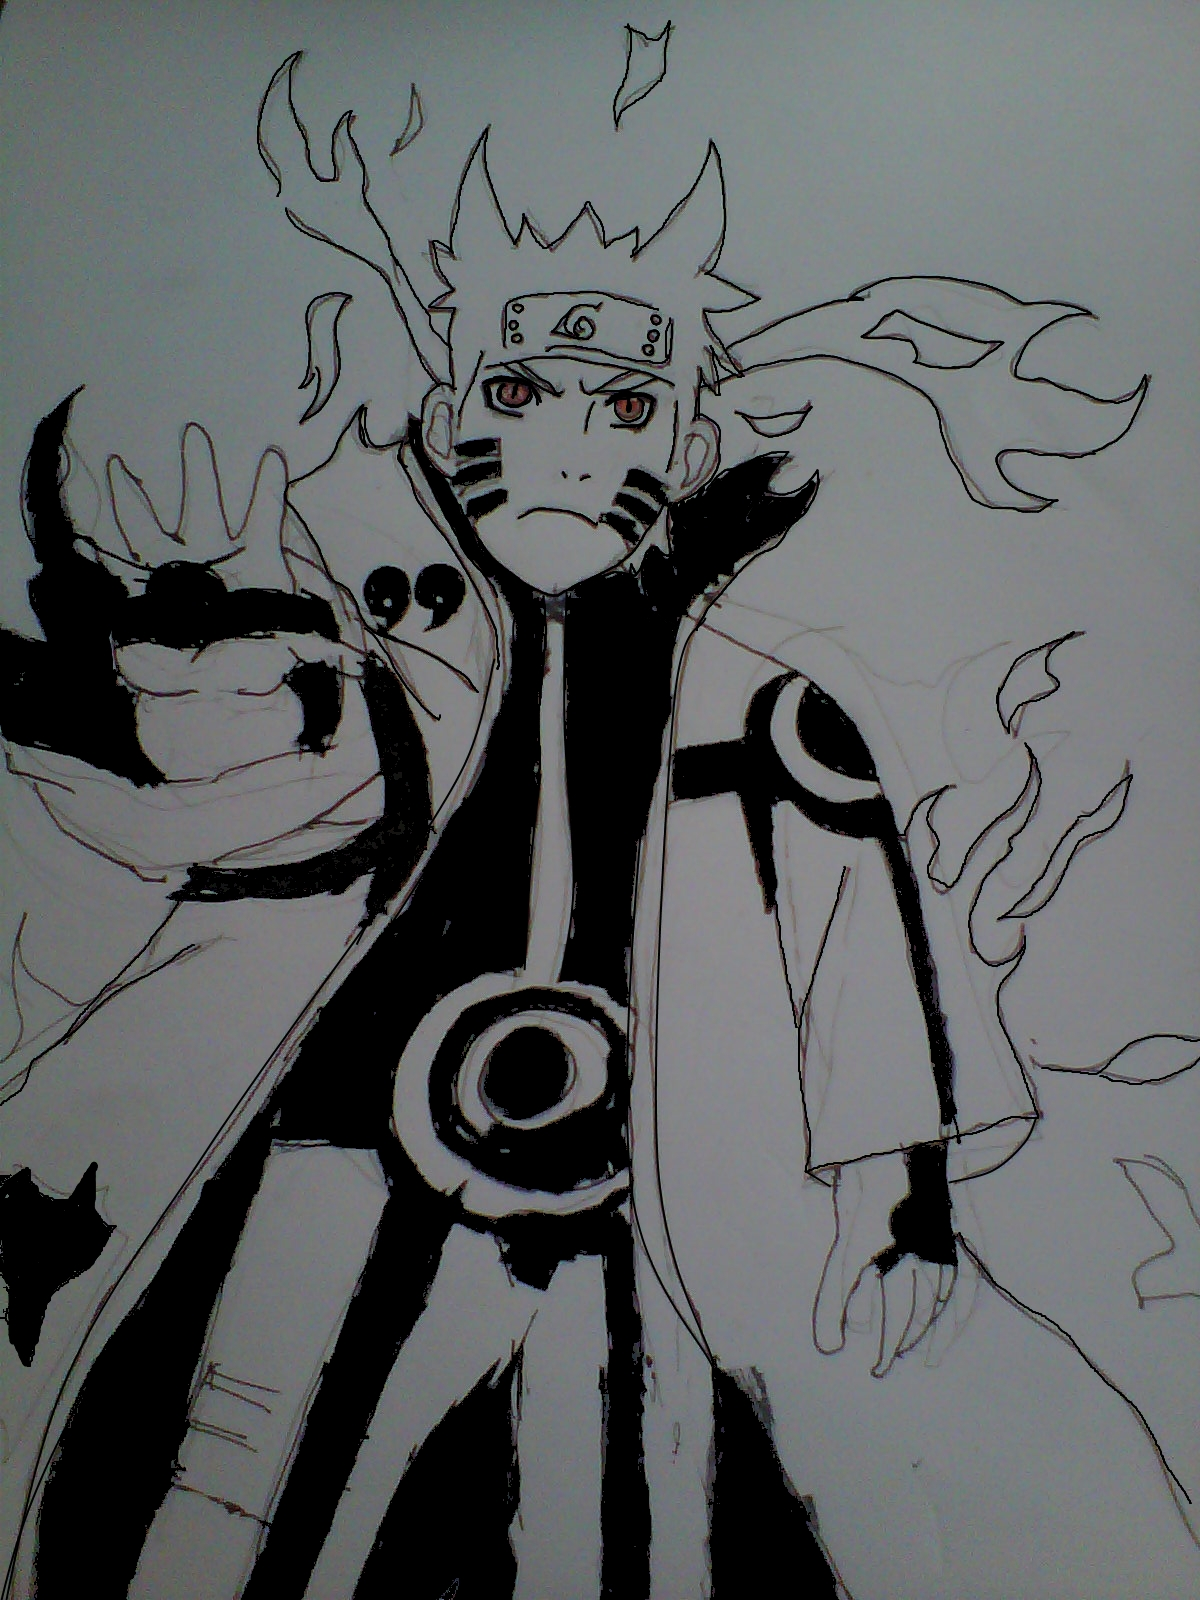 kcm(Kyuubi Chakra mode naruto) drawing by goldenfoxNaruto ...